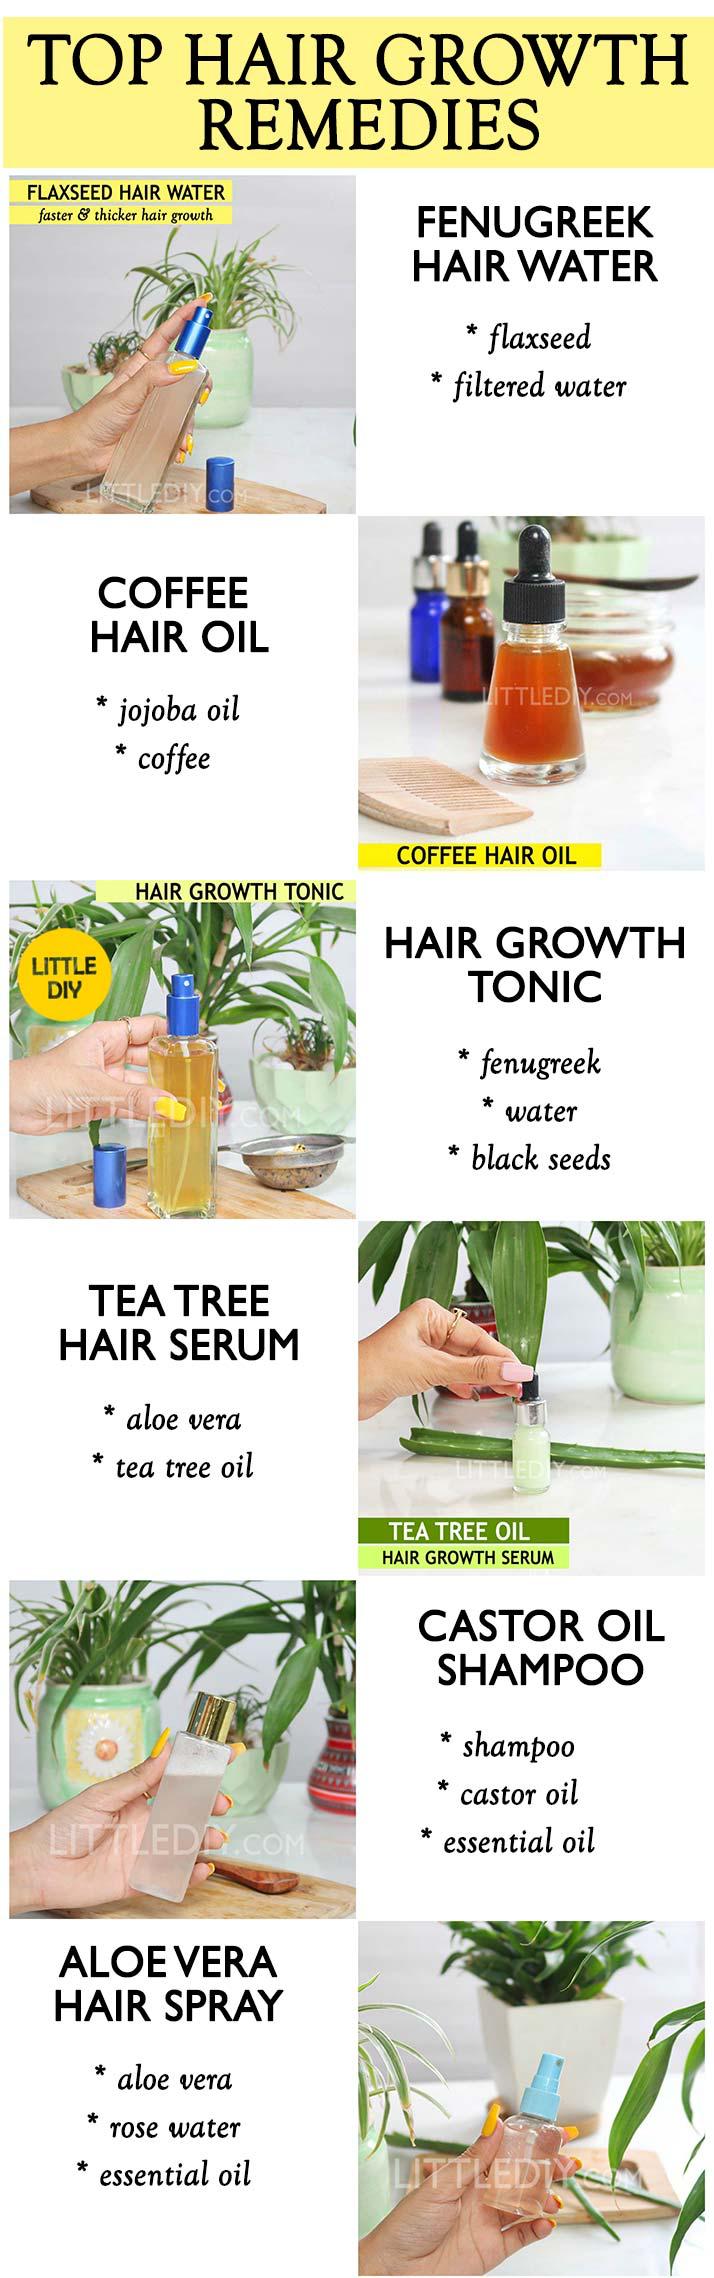 Top Amazing Diy Hair Growth Remedies Hair Remedies For Growth Diy Hairstyles Hair Growth Oil